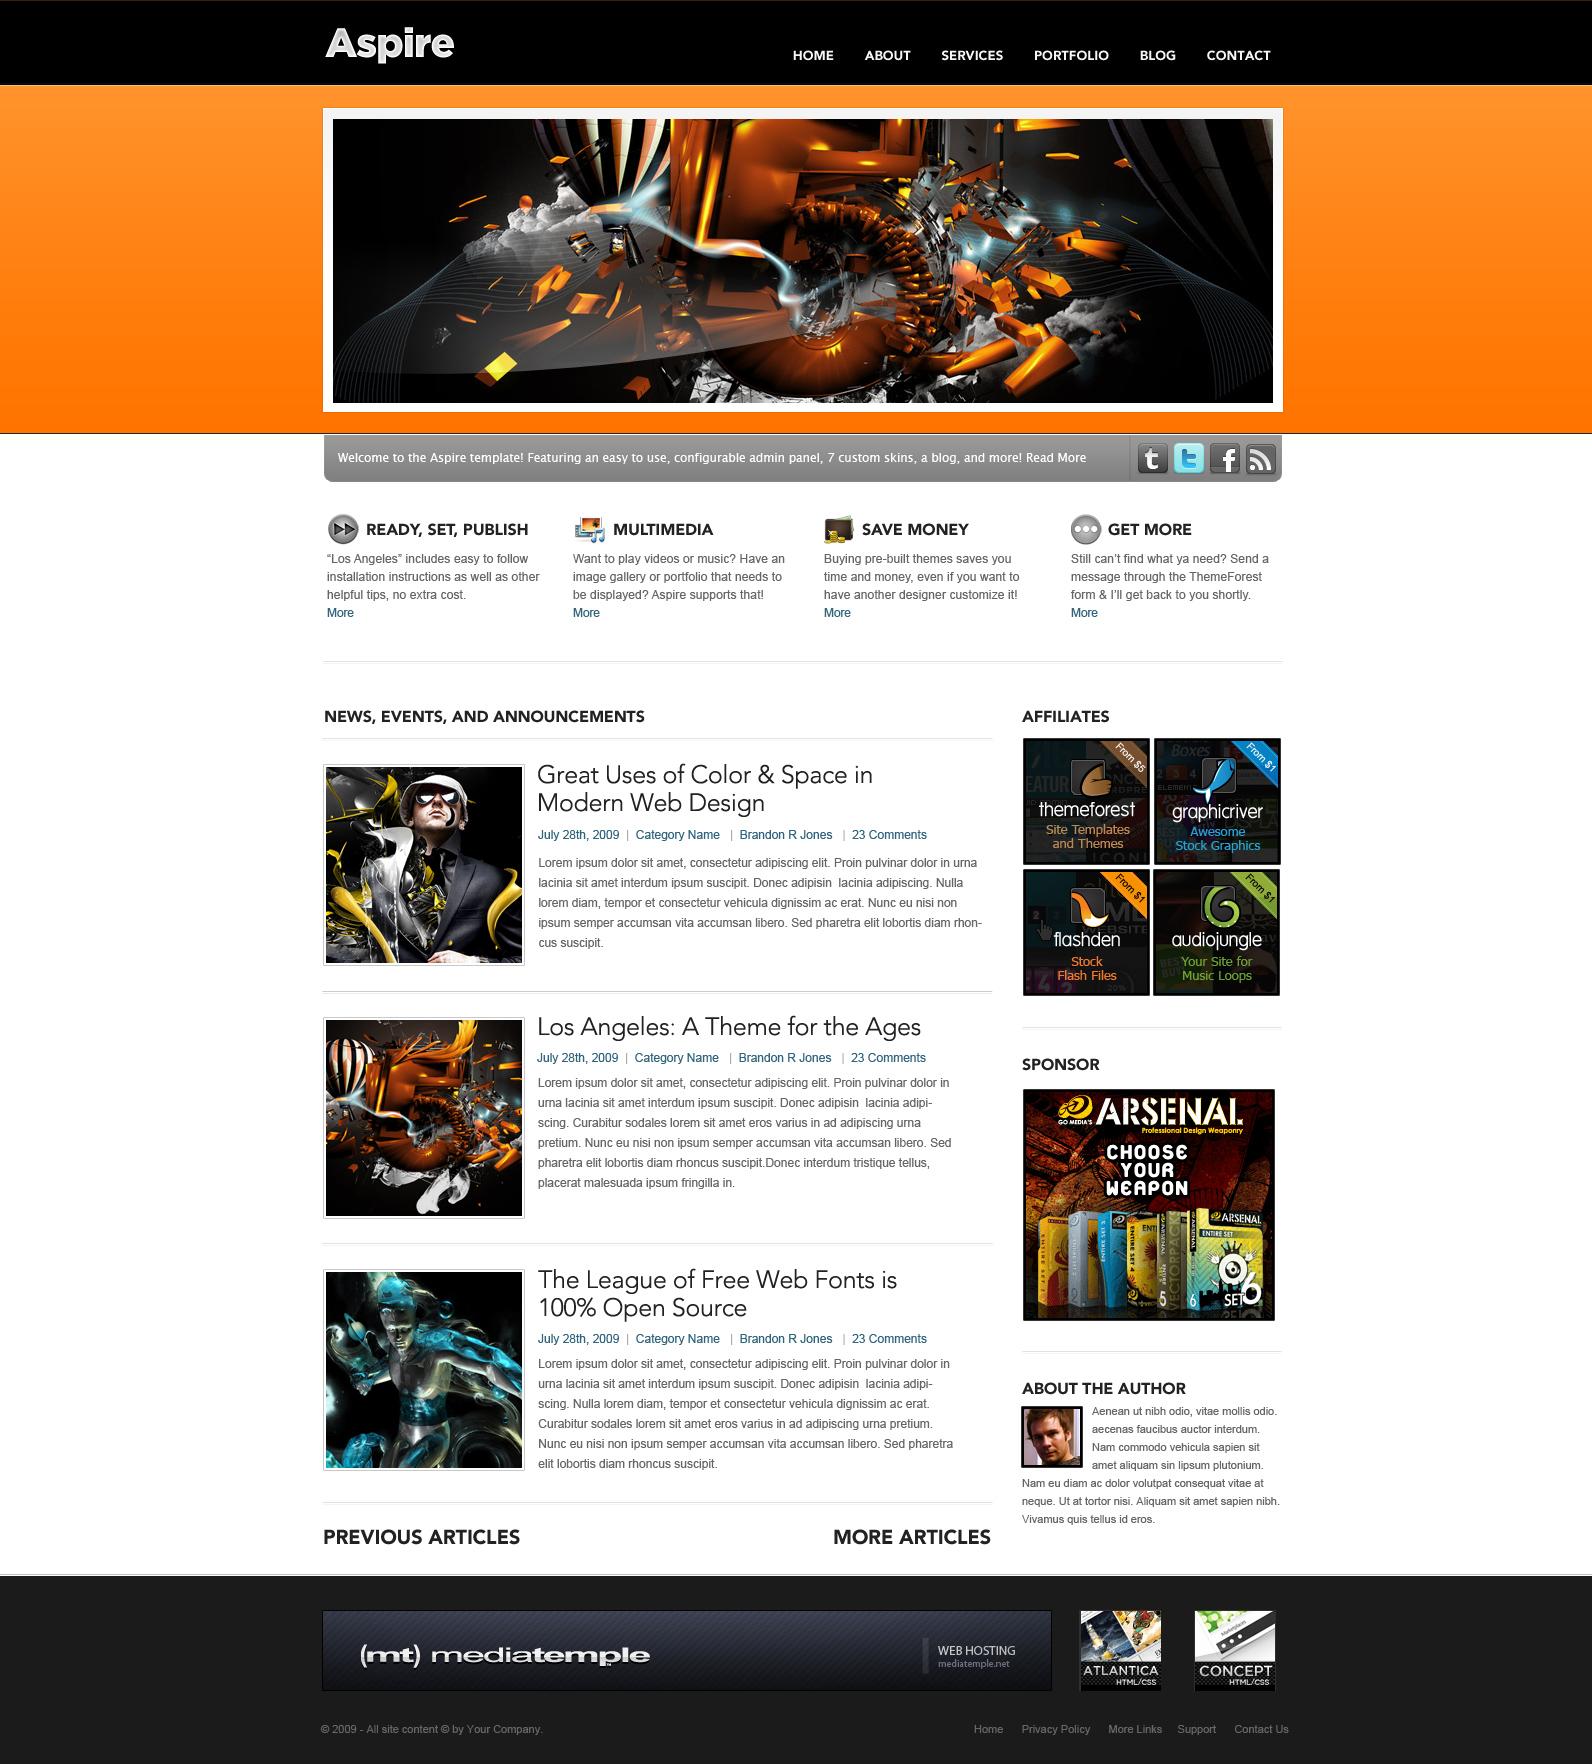 Aspire - 7 in 1 Business and Portfolio Site